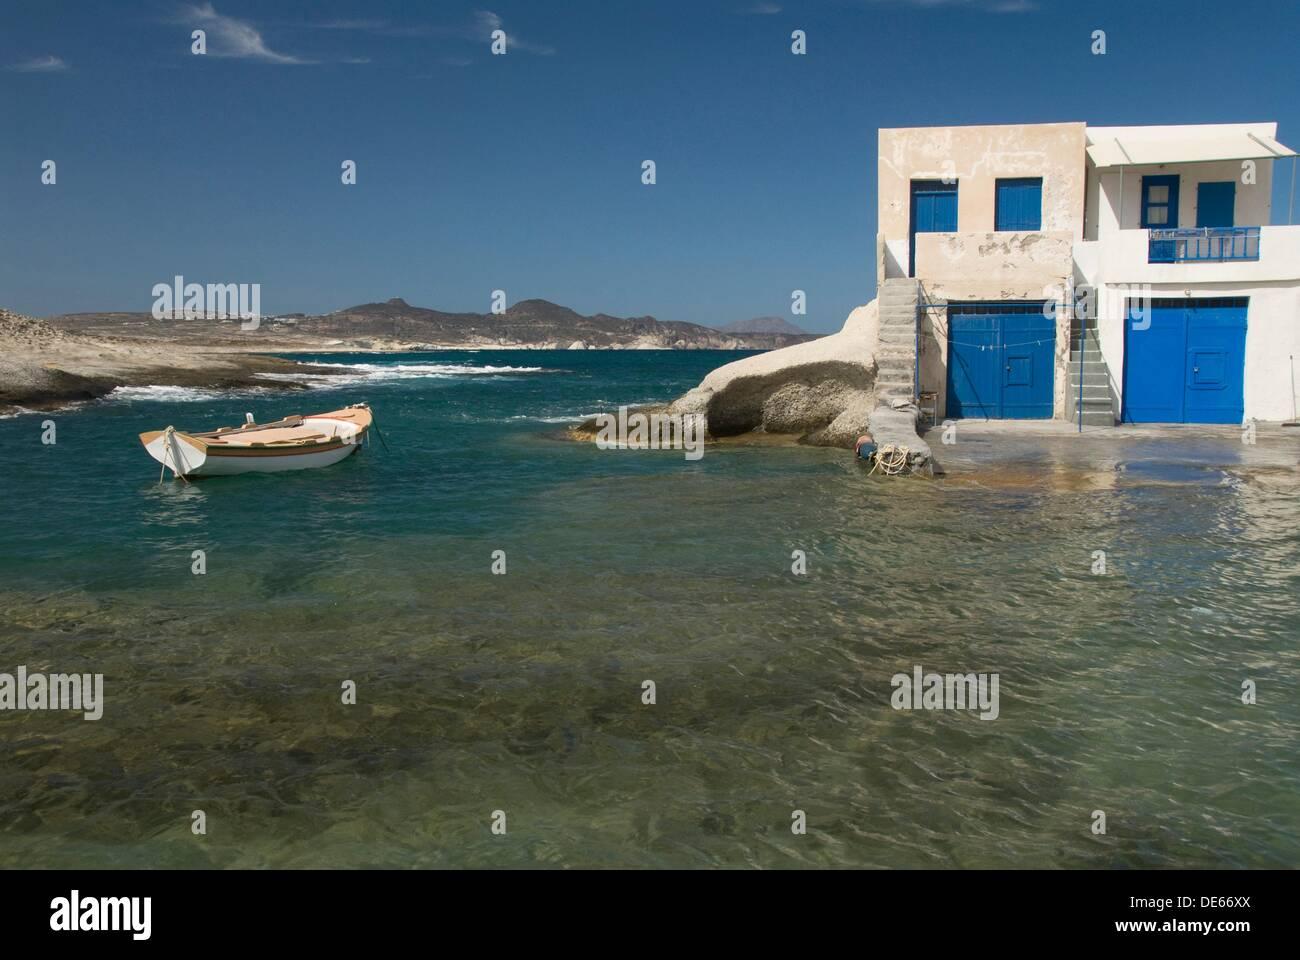 Small village near Agios Konstantinos, Island of Milos, Cyclades, Greece - Stock Image